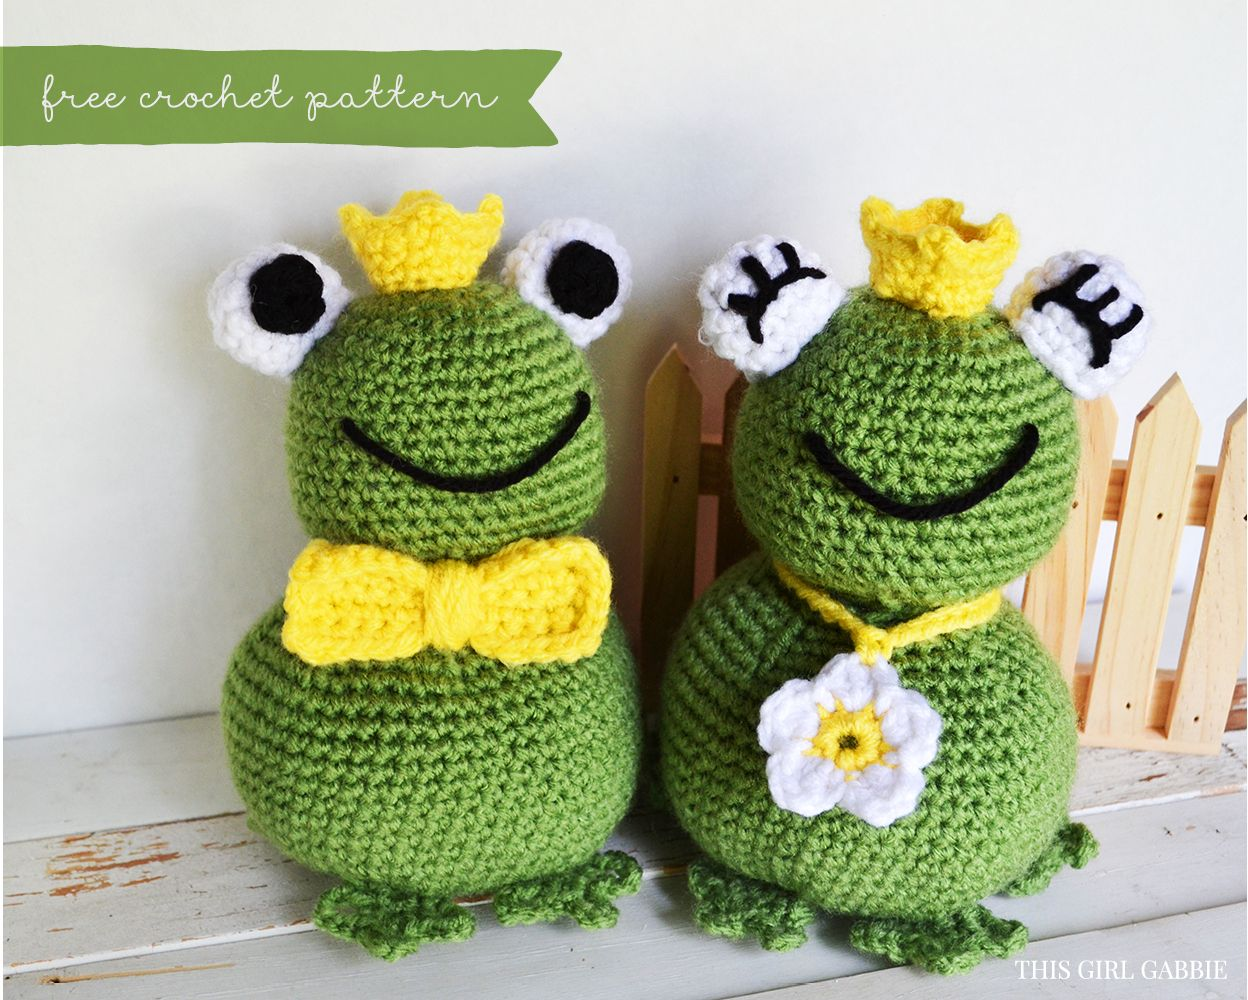 Free crochet pattern amigurumi frog prince and princess this free crochet pattern amigurumi frog prince and princess this girl gabbie bankloansurffo Gallery